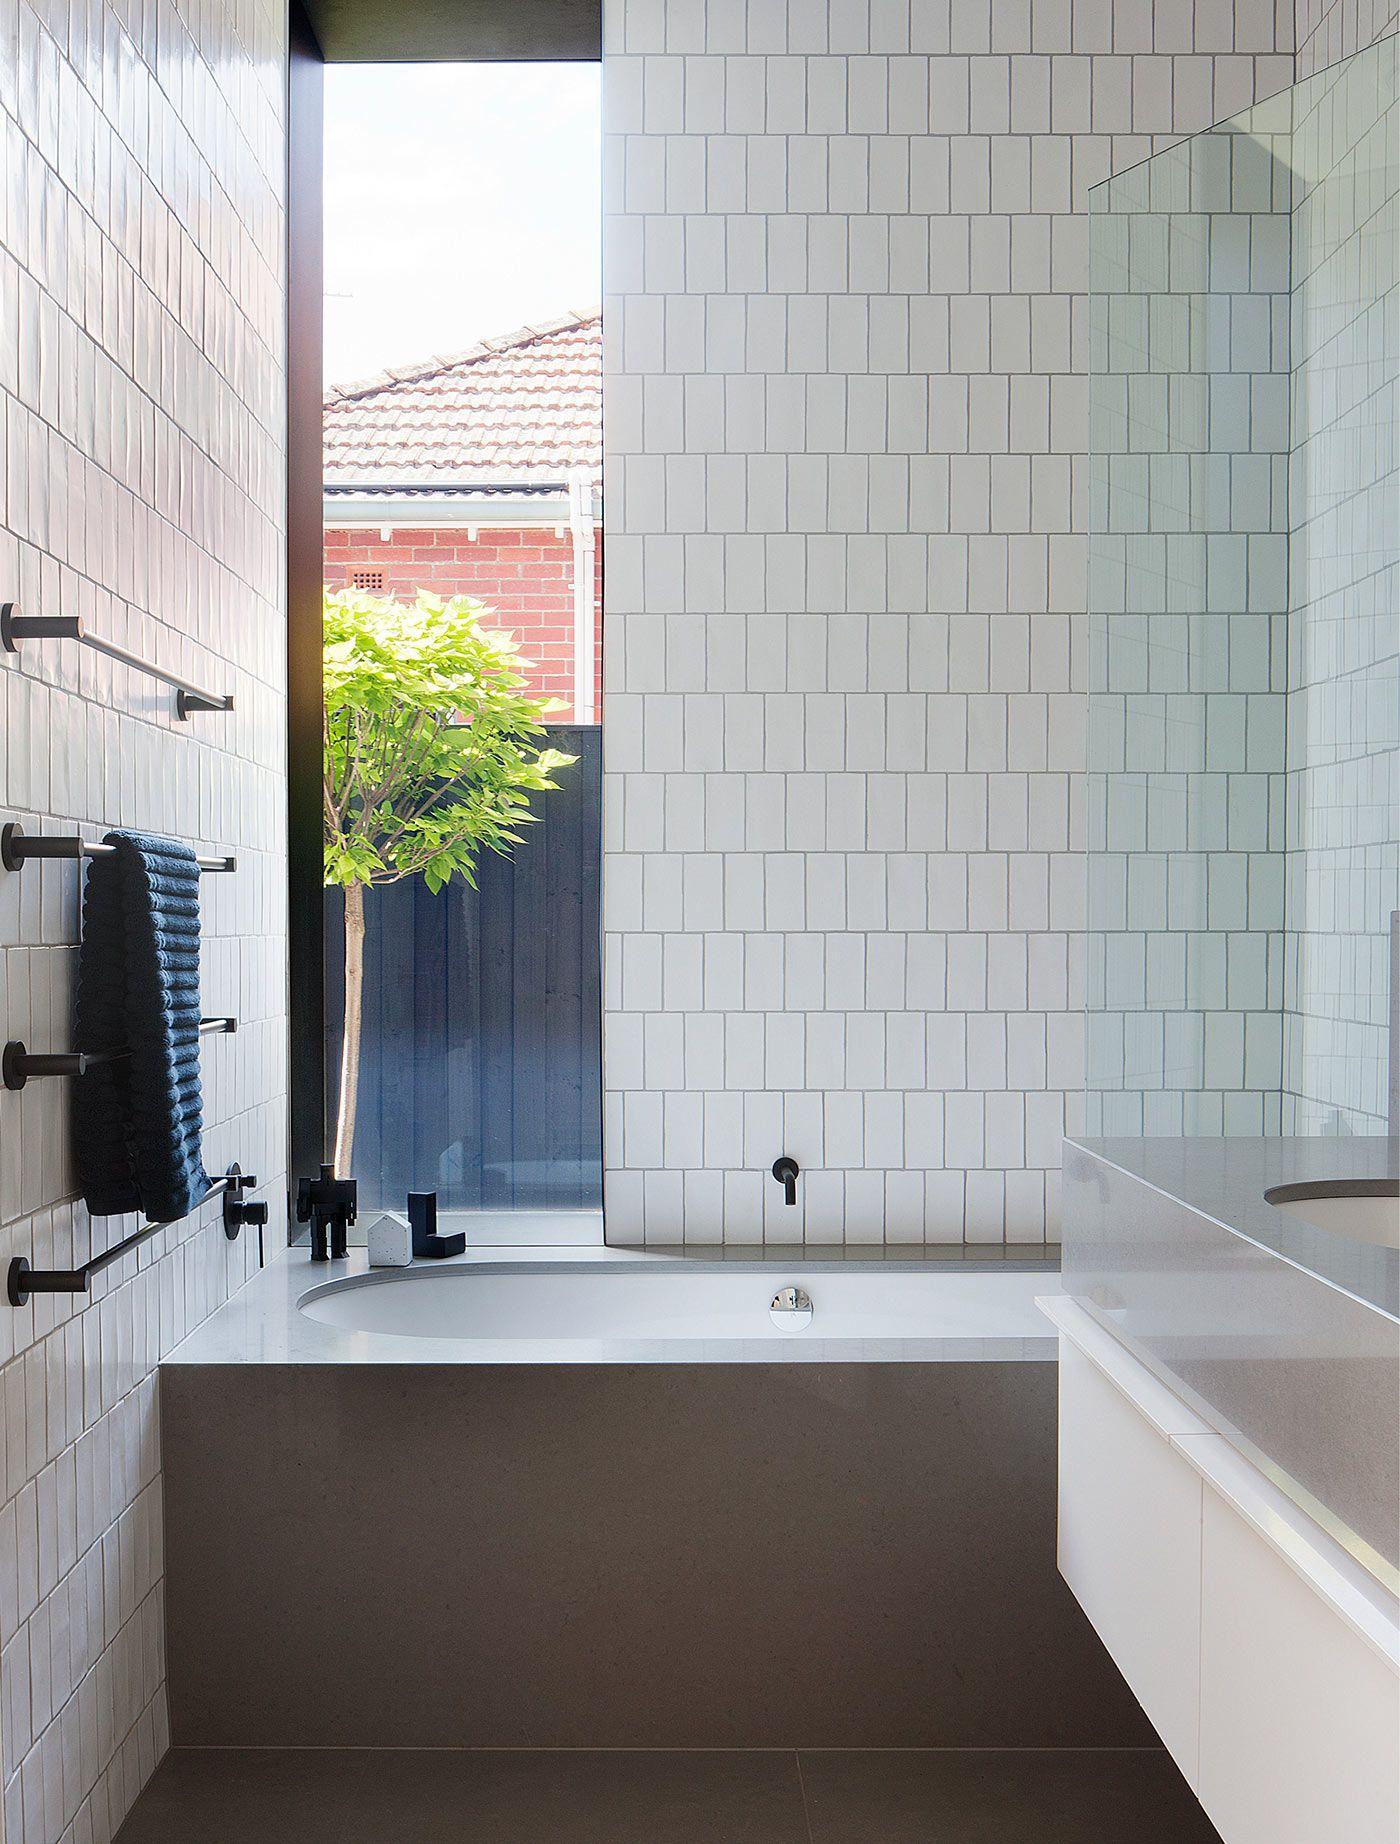 Pin by Céline Dufresne on Salle de bain - Bathroom | Pinterest ...